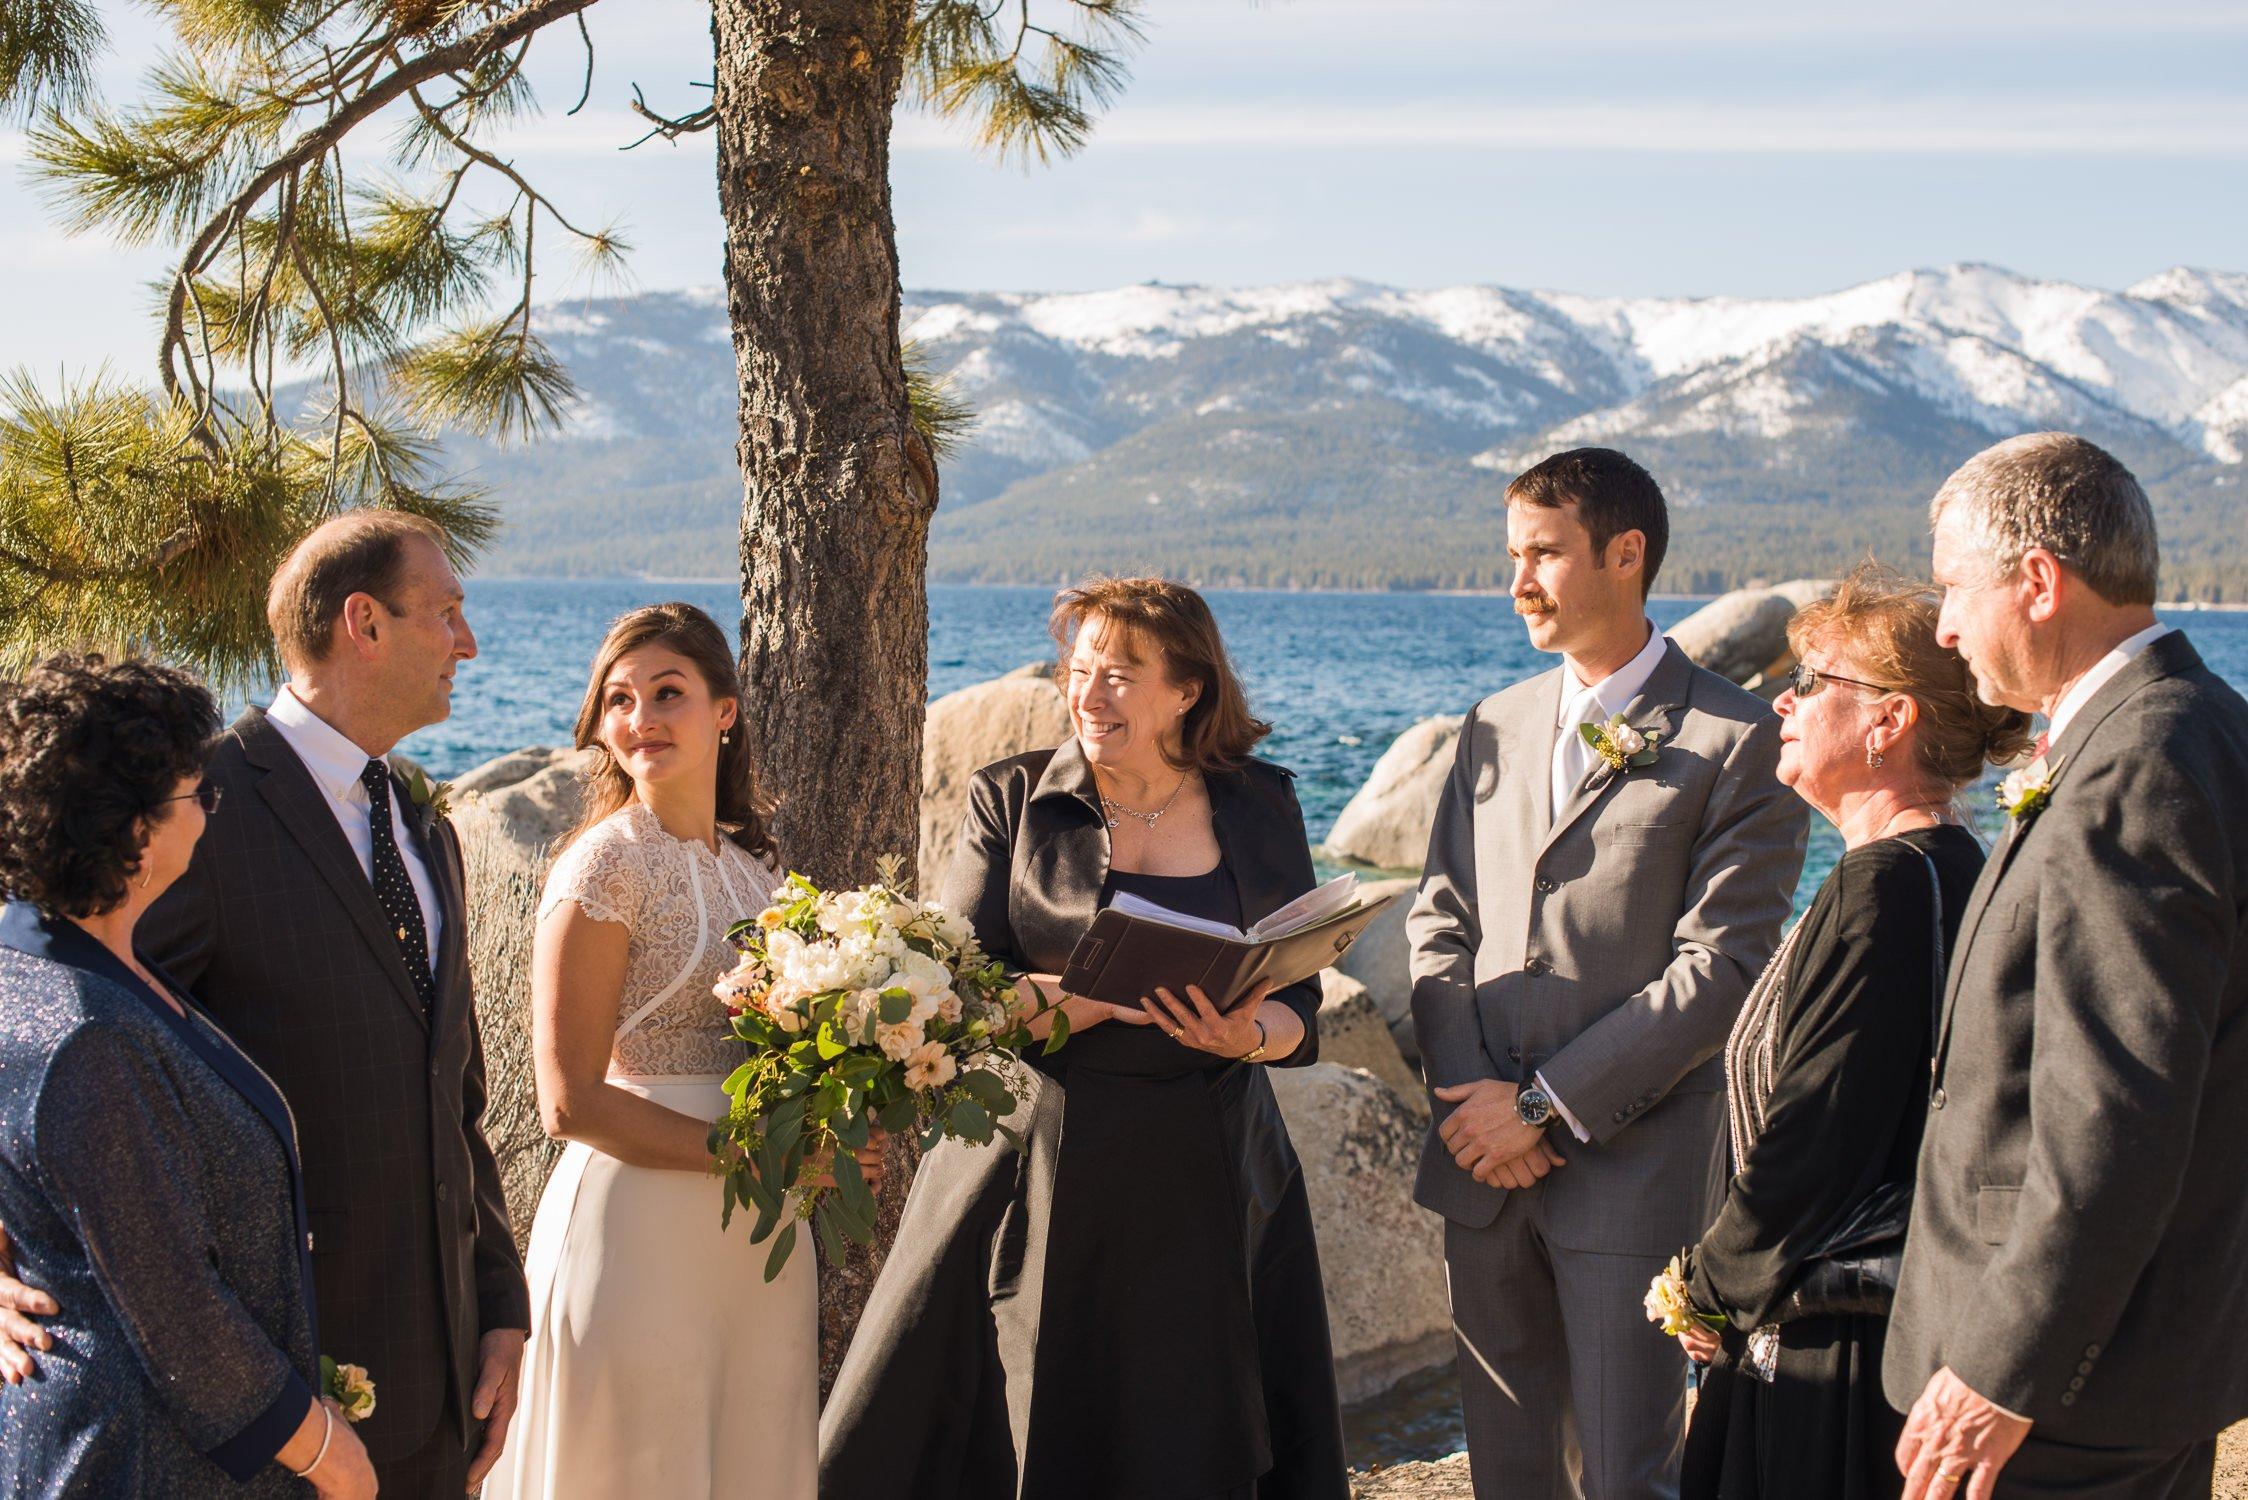 Lake Tahoe Wedding Officiants